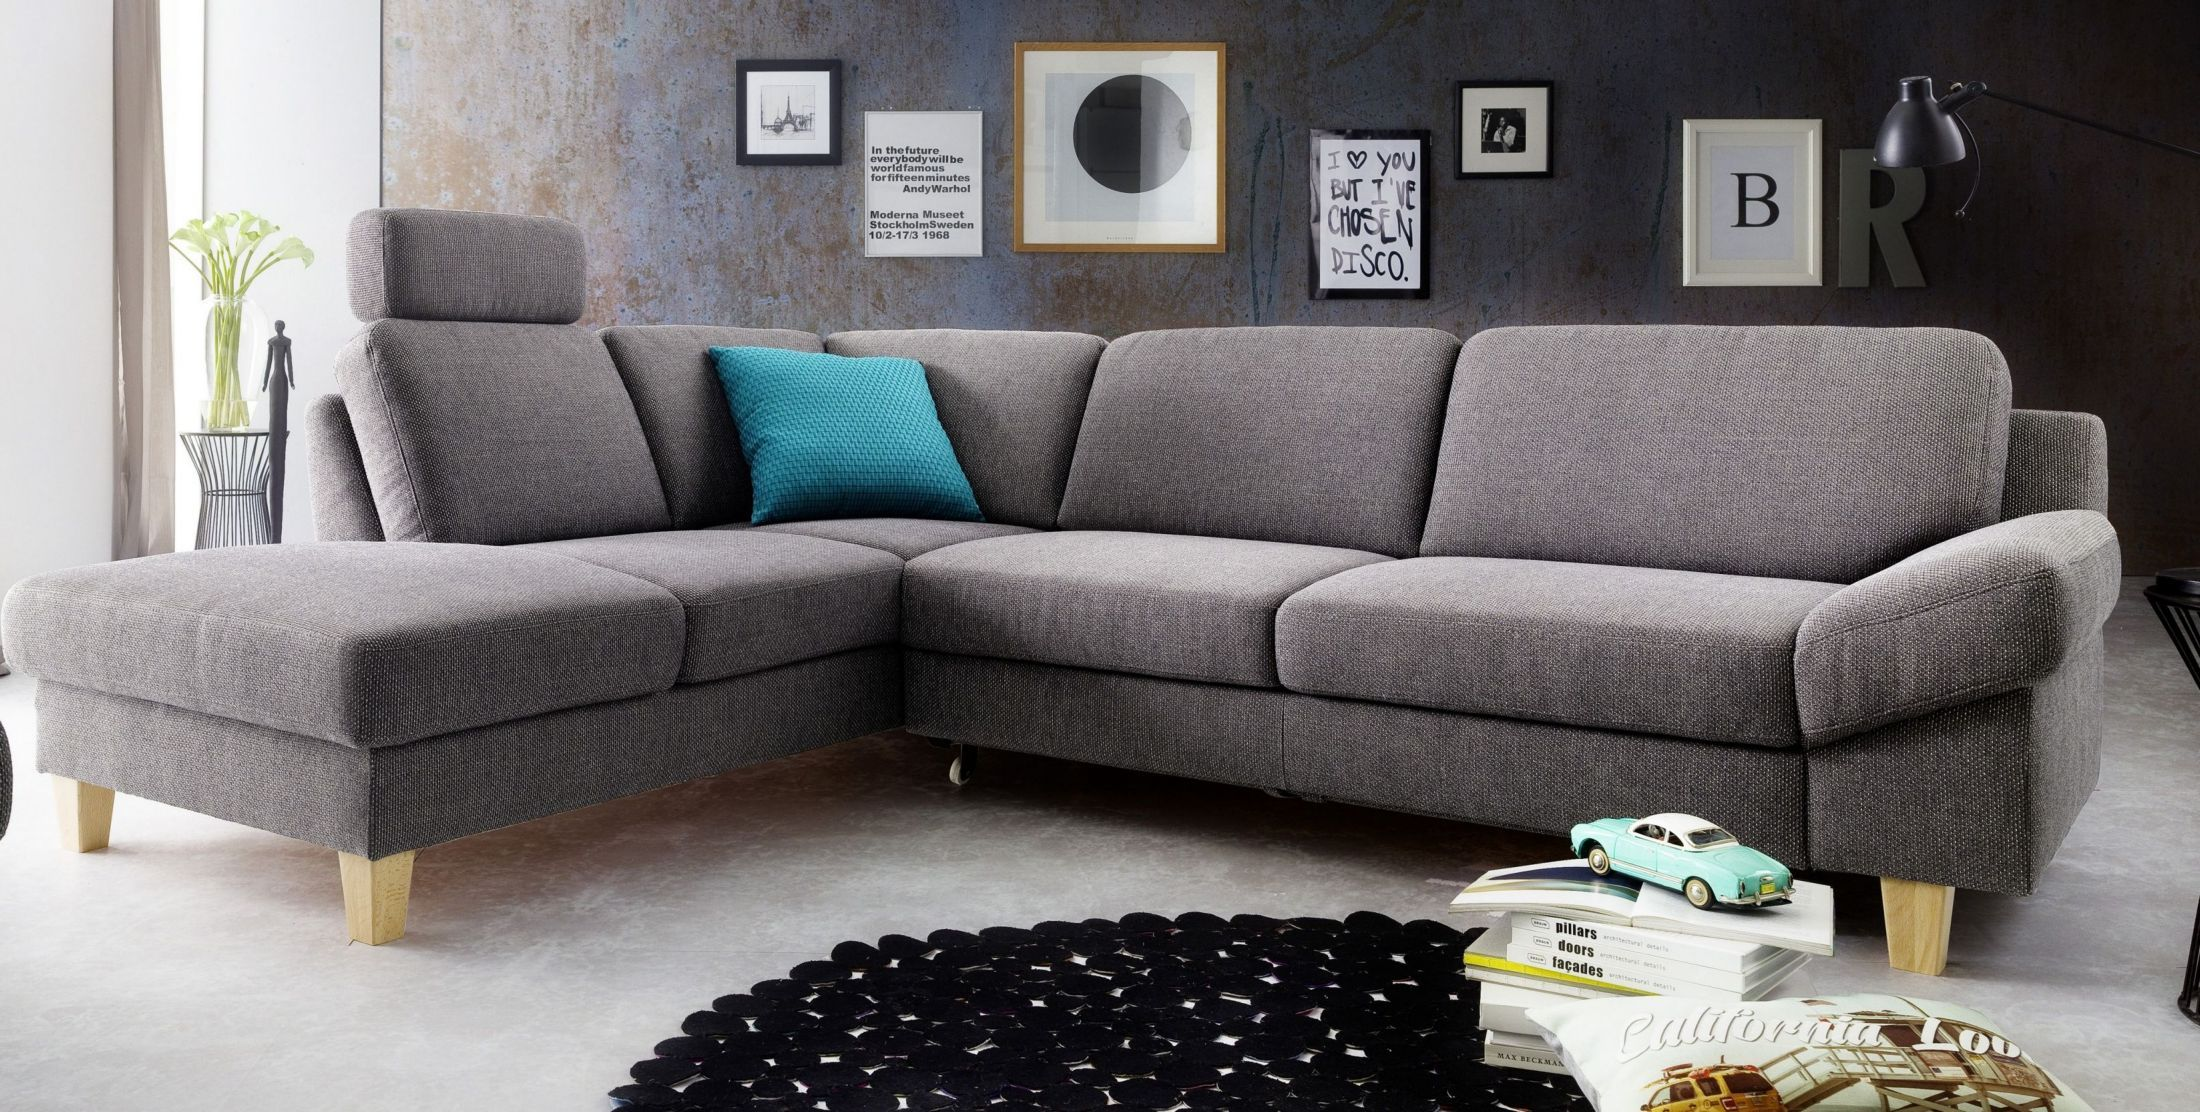 Top Ergebnis 50 Elegant Big sofa Rosa Bilder 2017 Shdy7 2017